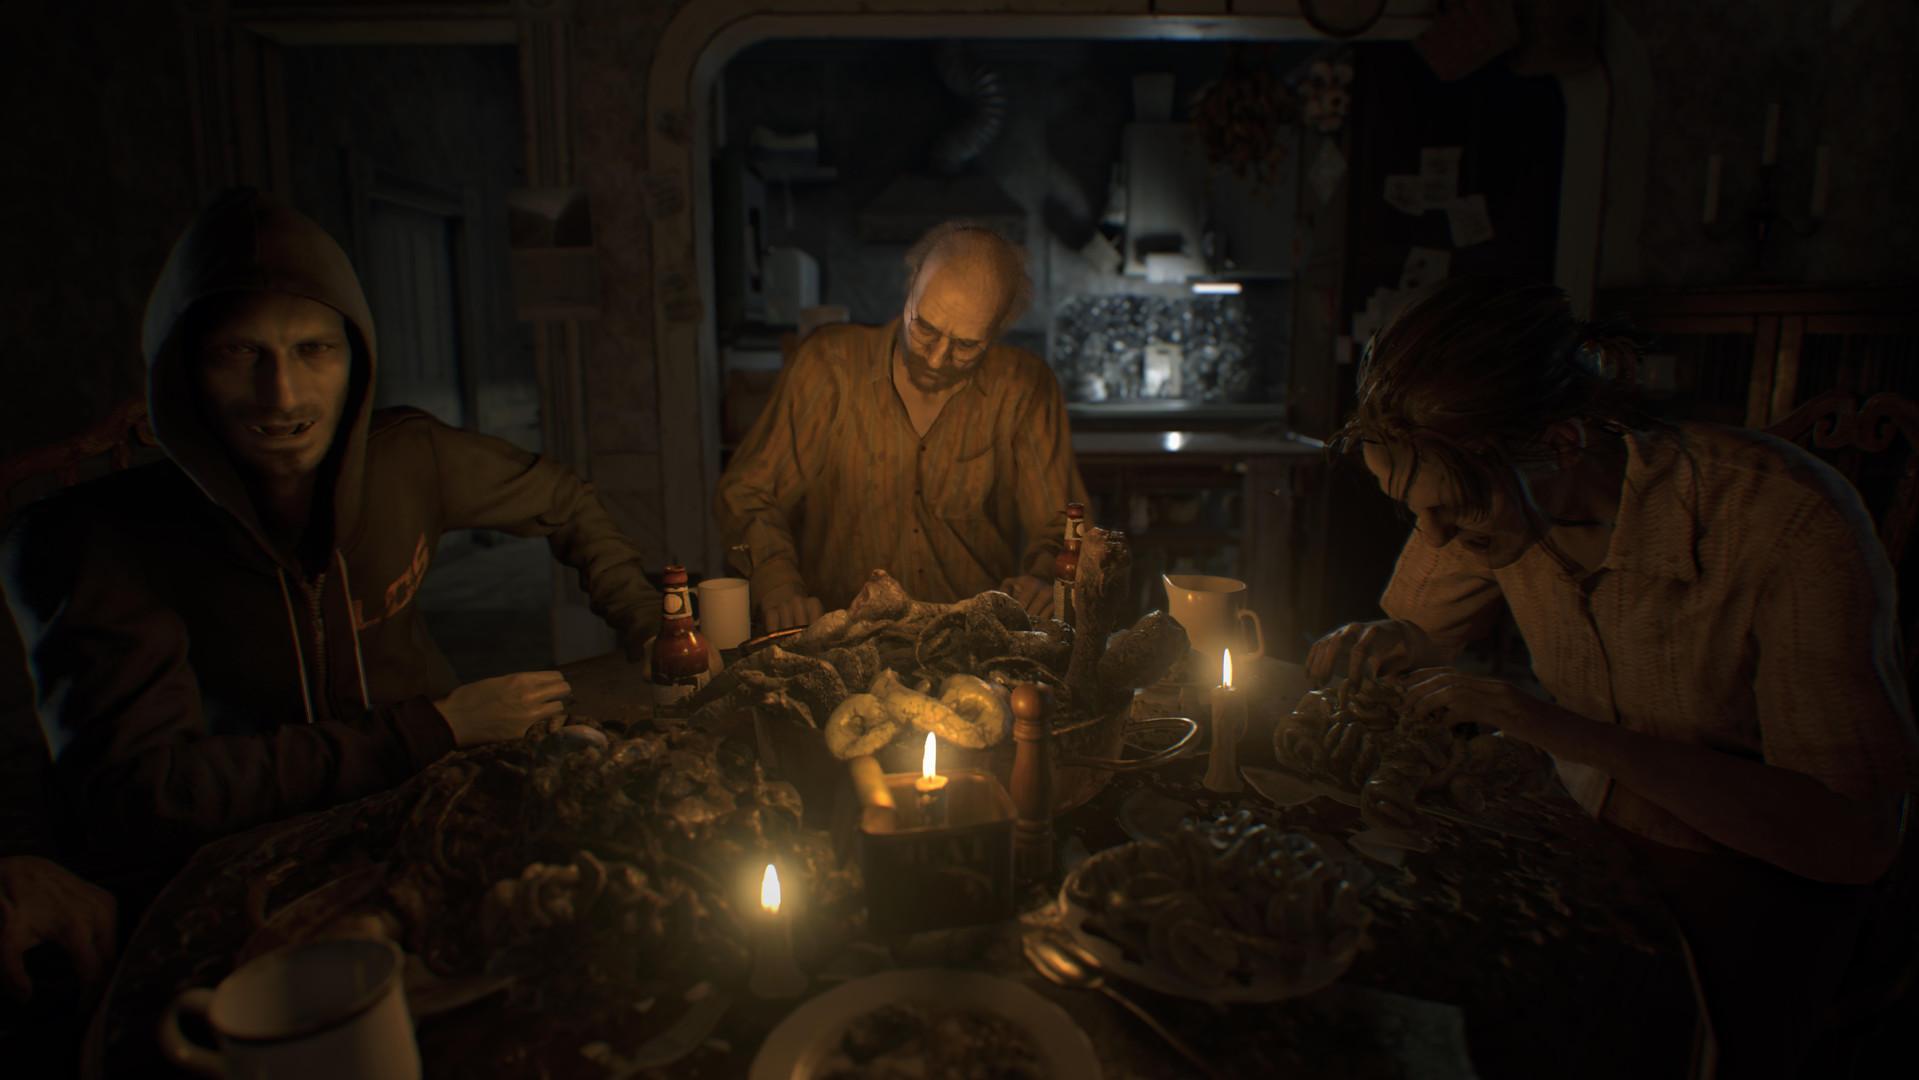 Resident Evil 7: Biohazard Screenshot 1